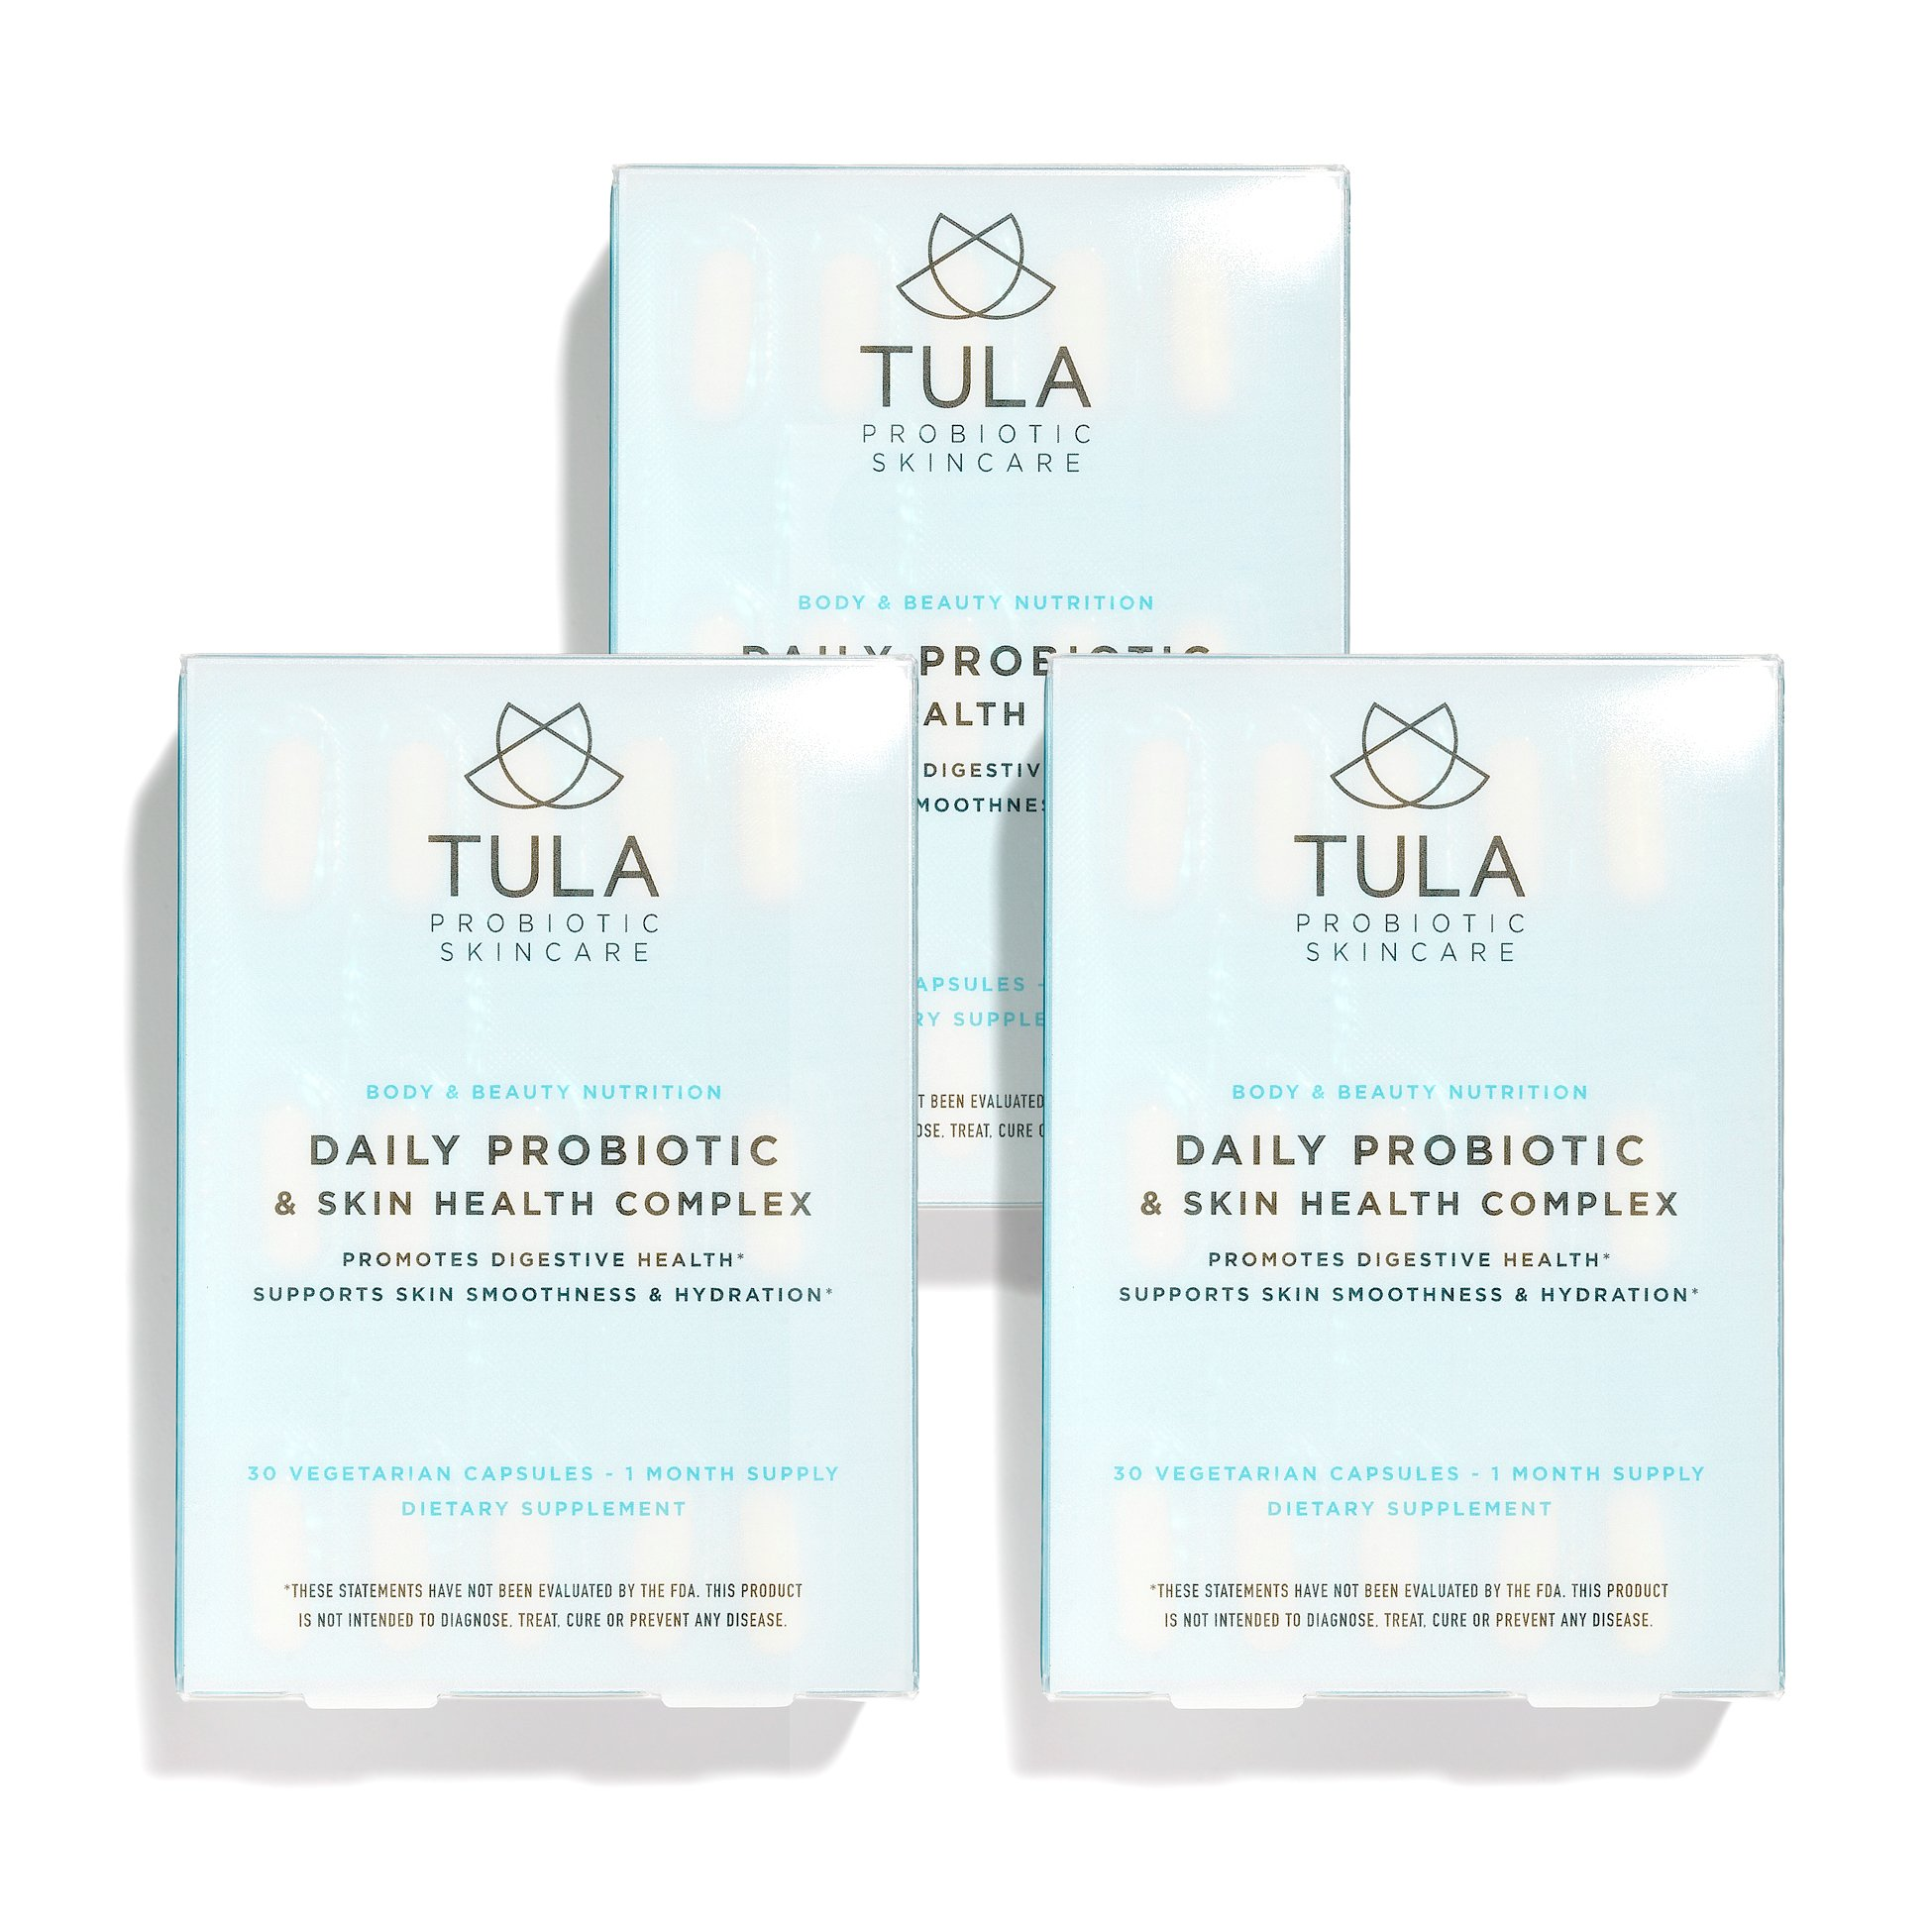 TULA Probiotic Skincare Daily Probiotic & Skin Health Complex (Pack of 3) | Women's Daily Probiotic, Digestive & Skin Health Supplement |10 billion CFU, Ceramide & Antioxidant | 30 Capsules X 3